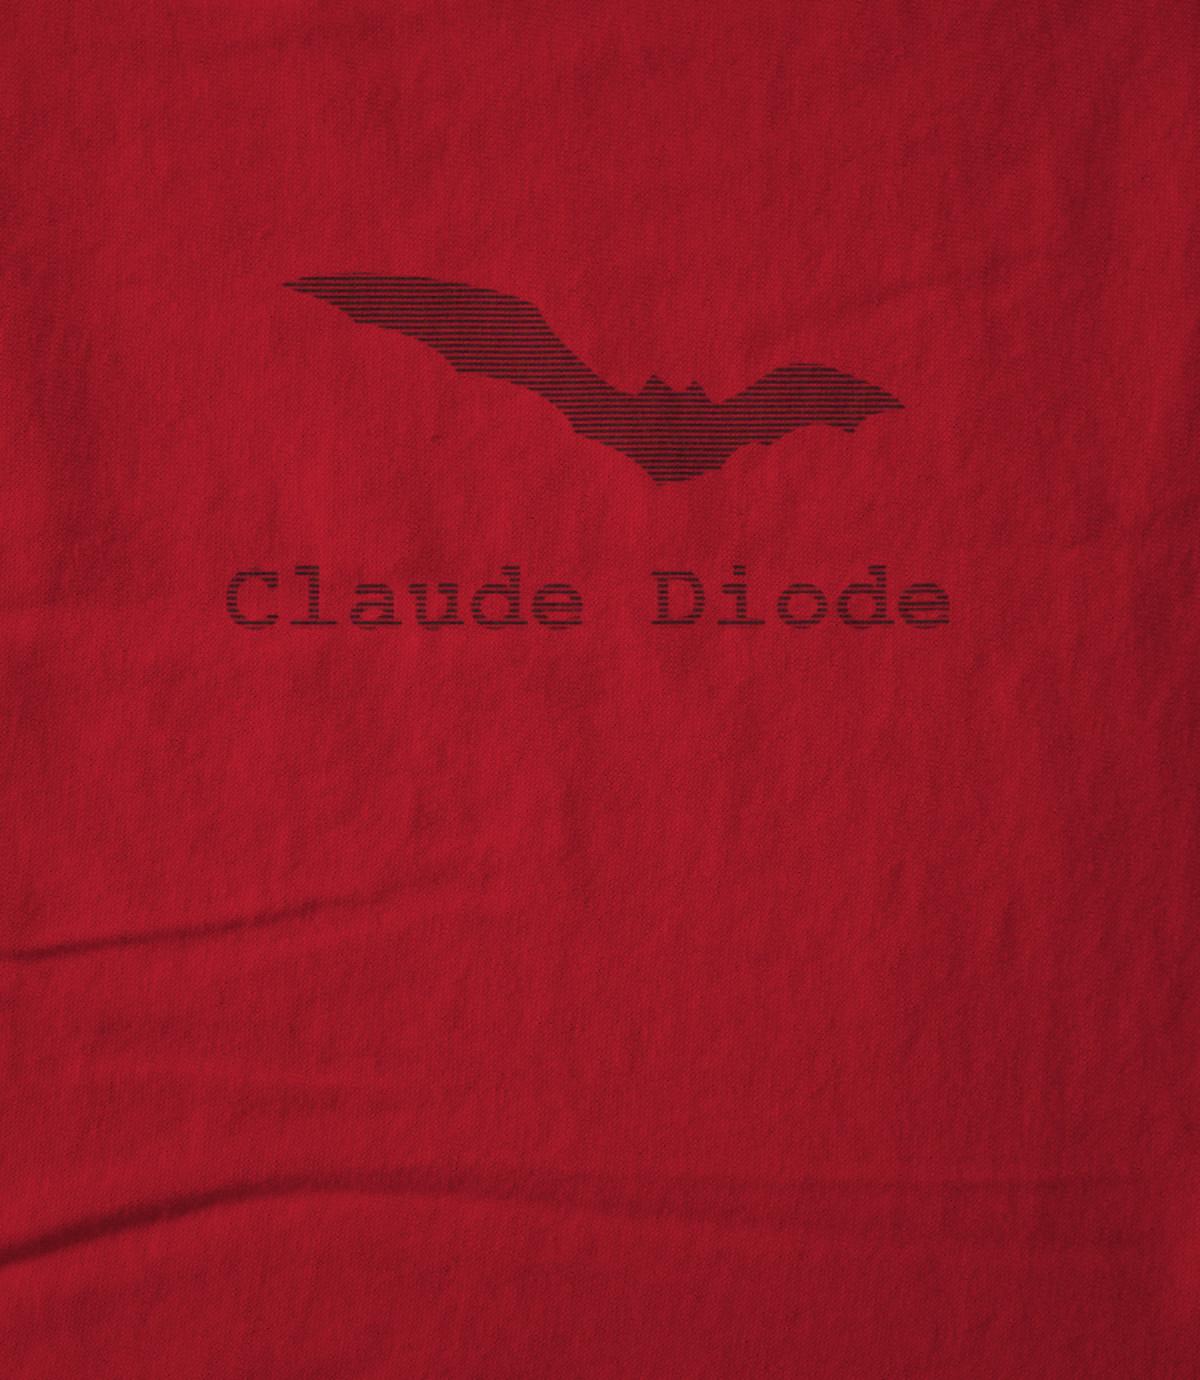 Claude diode claude diode   claude diode bat logo  1507940541